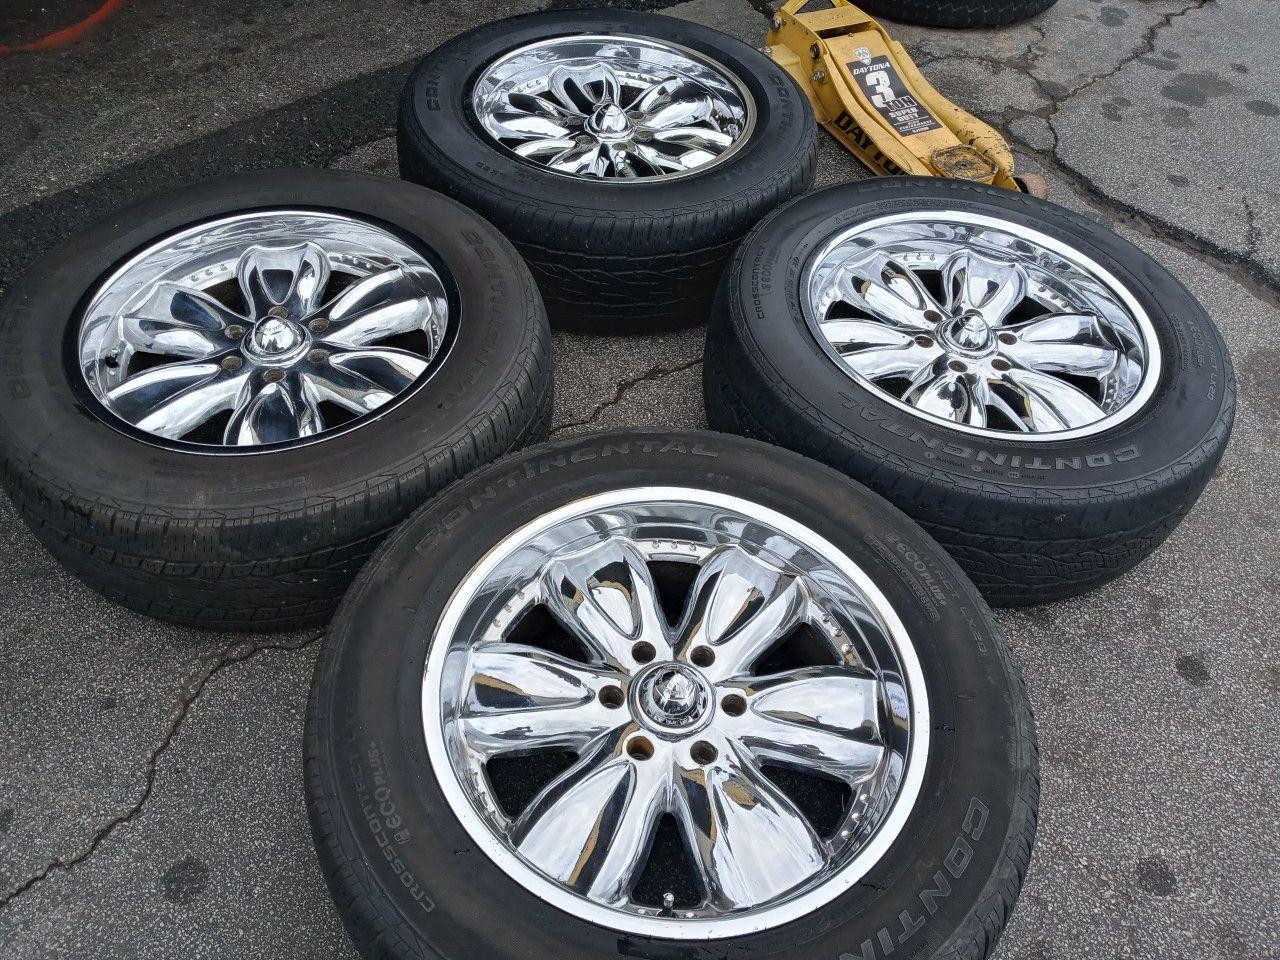 4 wheels end tires Chevrolet Silverado suburban Nissan Taitan 6 lug rin 20